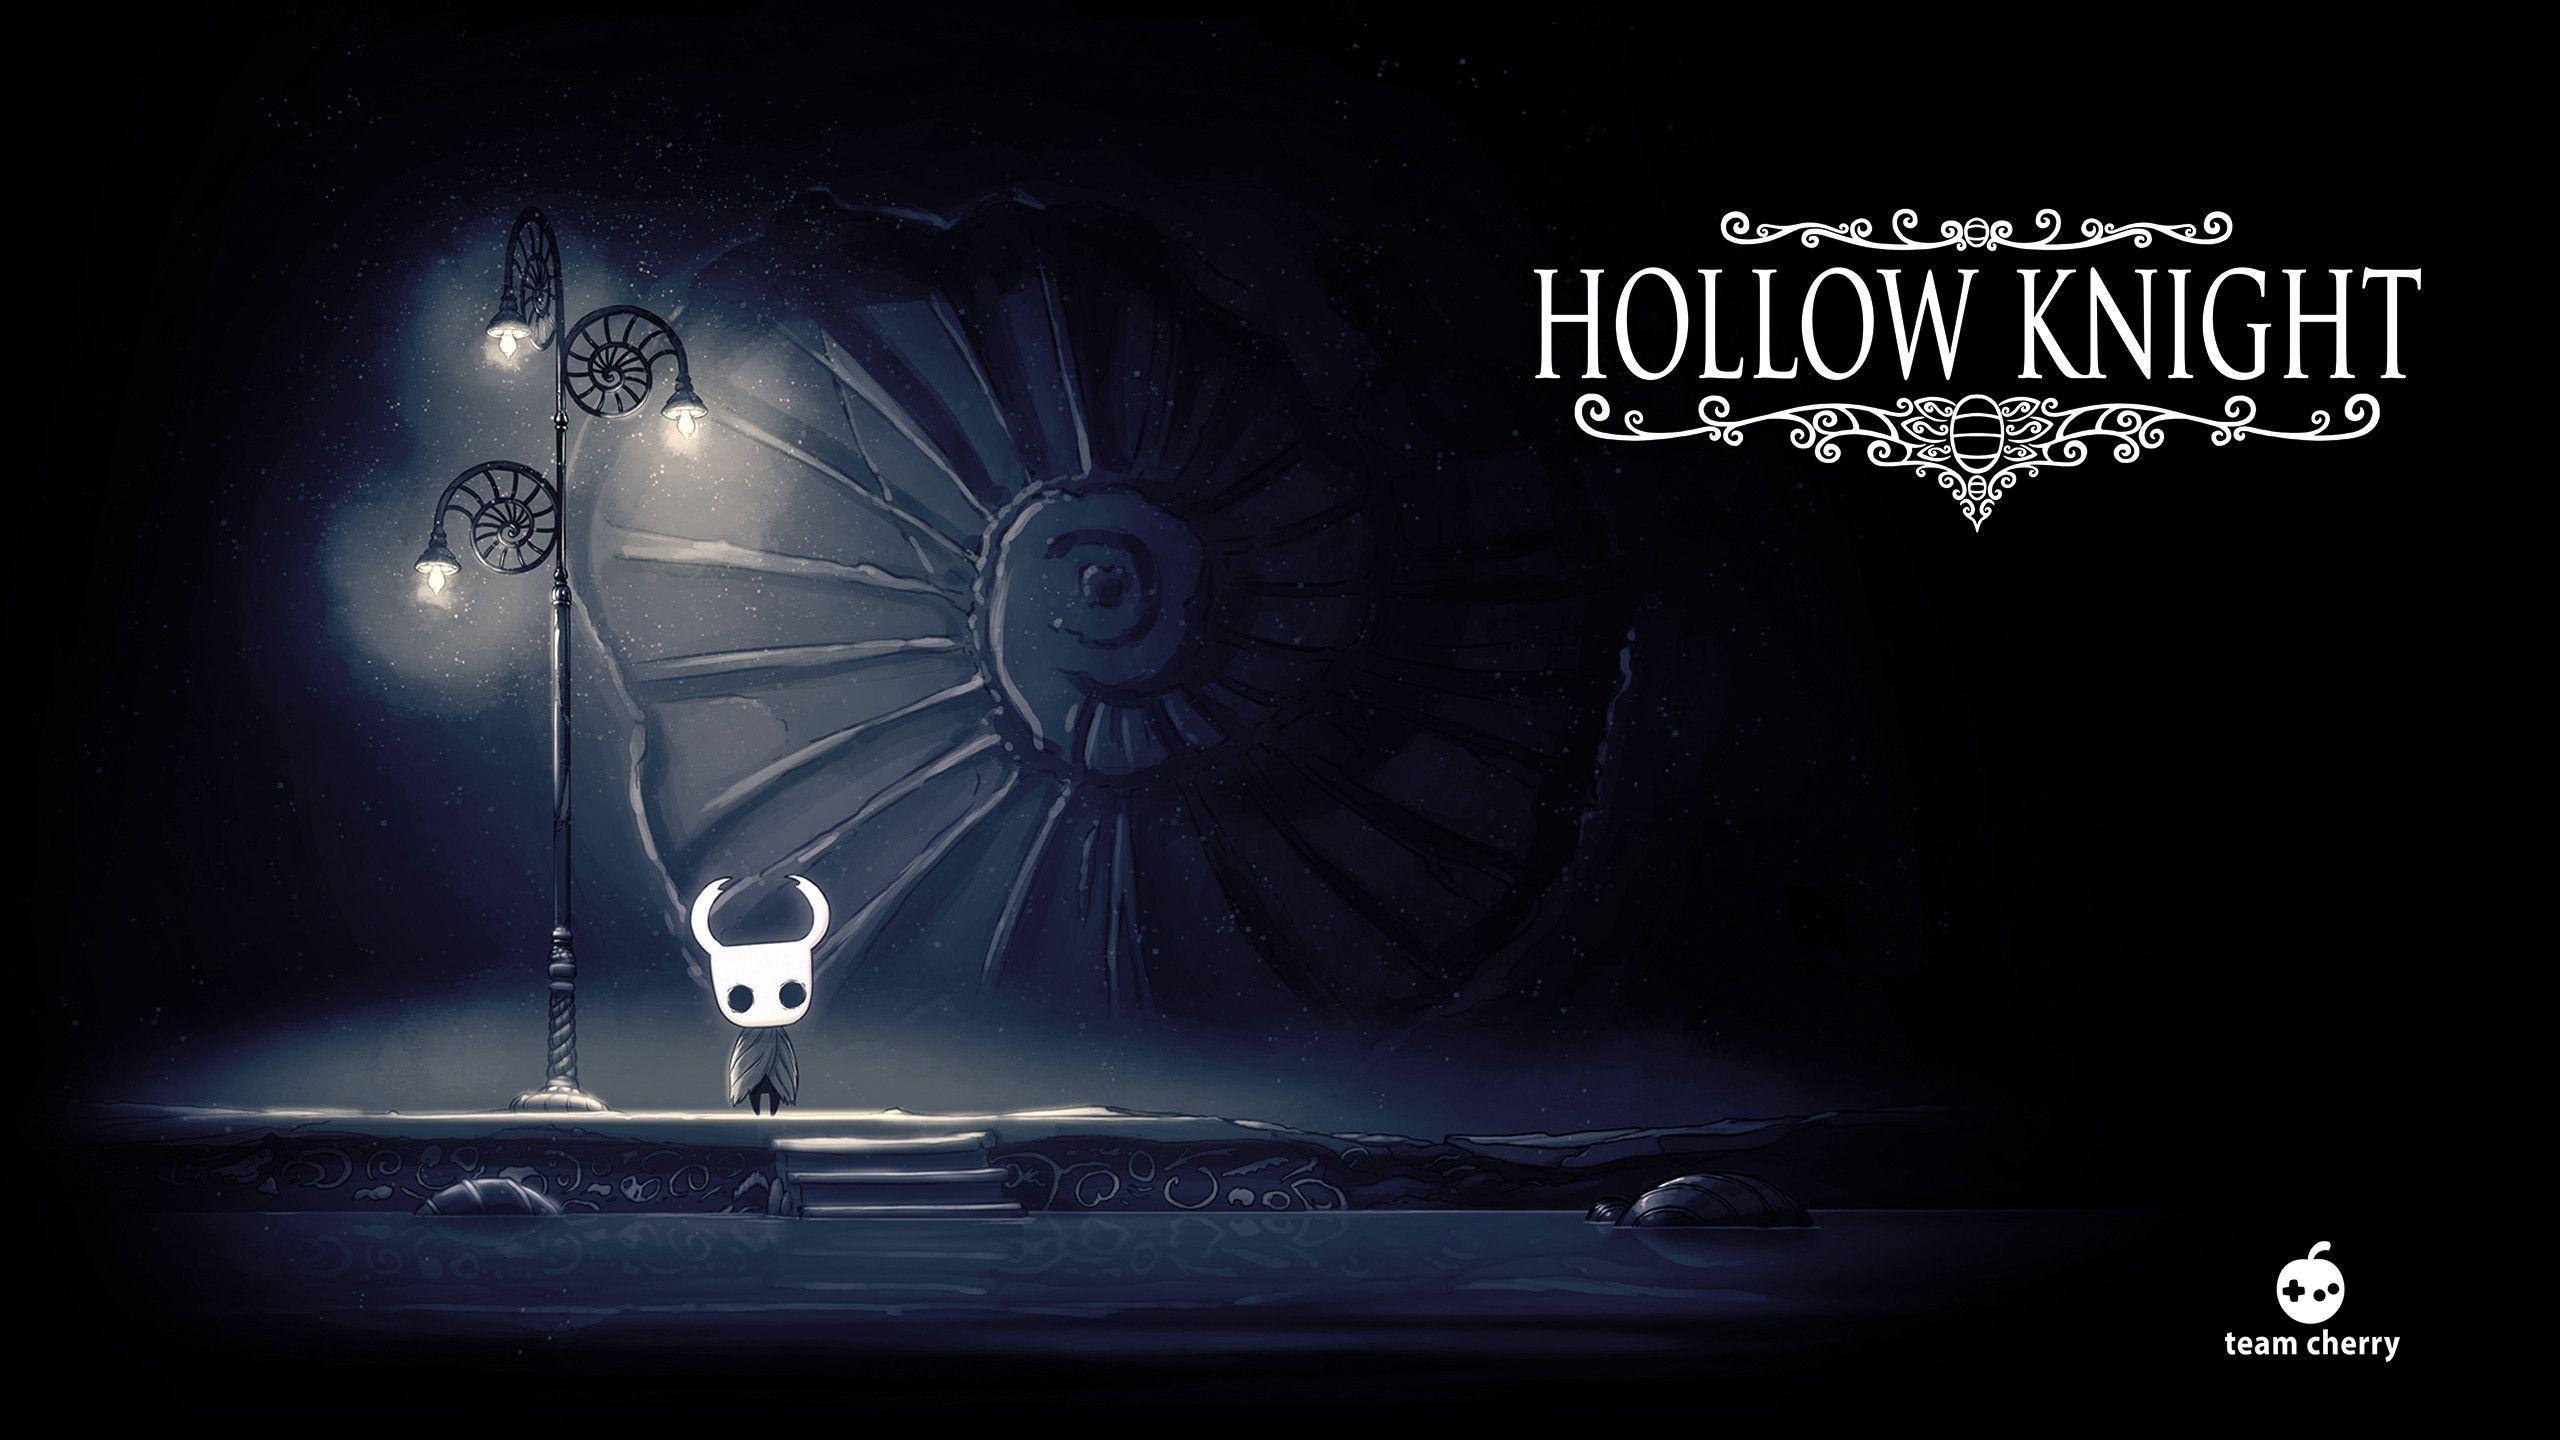 hollowknight pc wallpaper